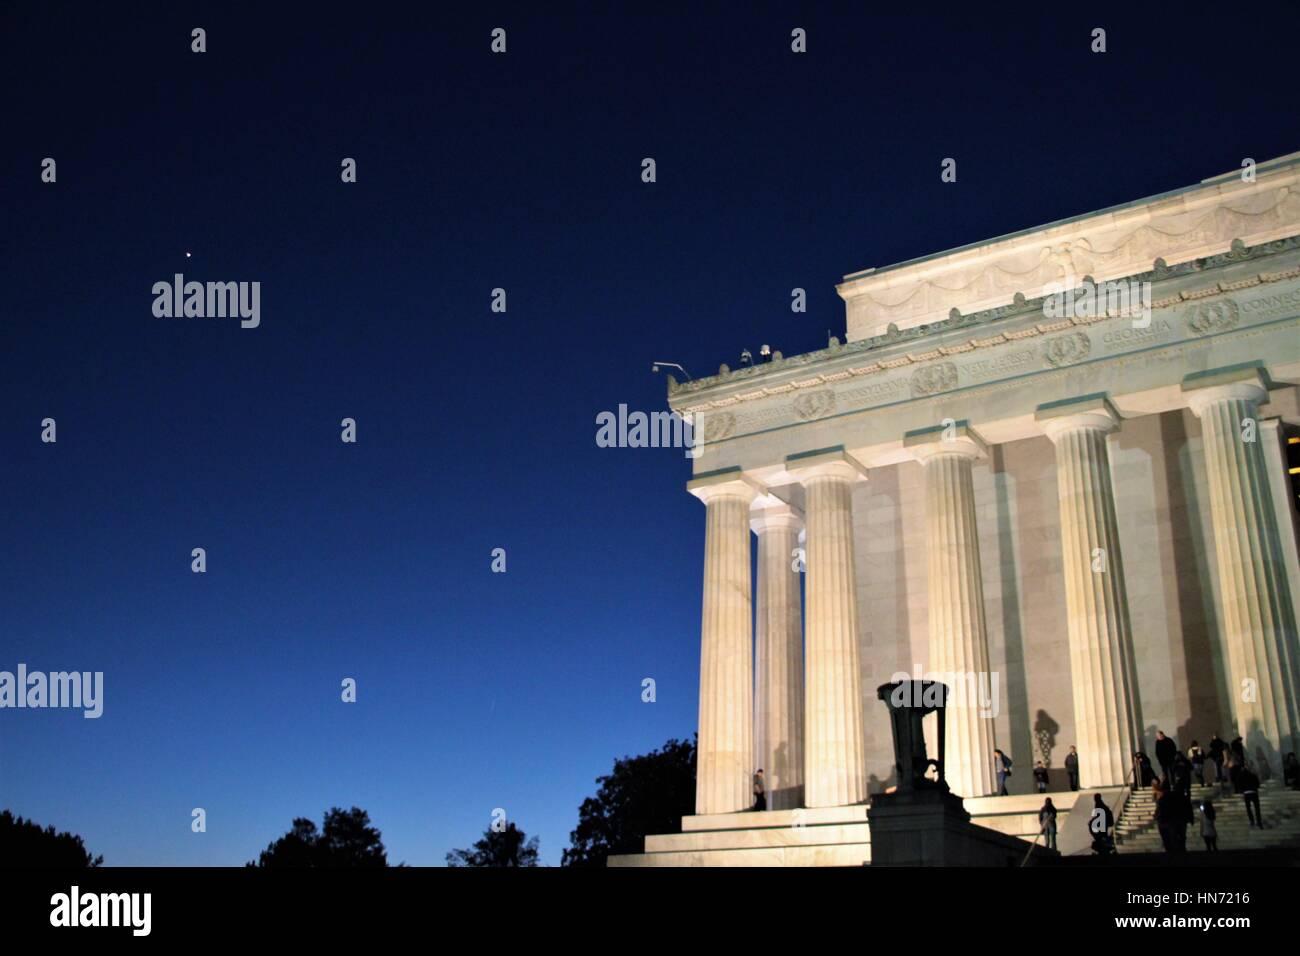 Lincoln Memorial at night with Venus rising above, Washington DC - Stock Image